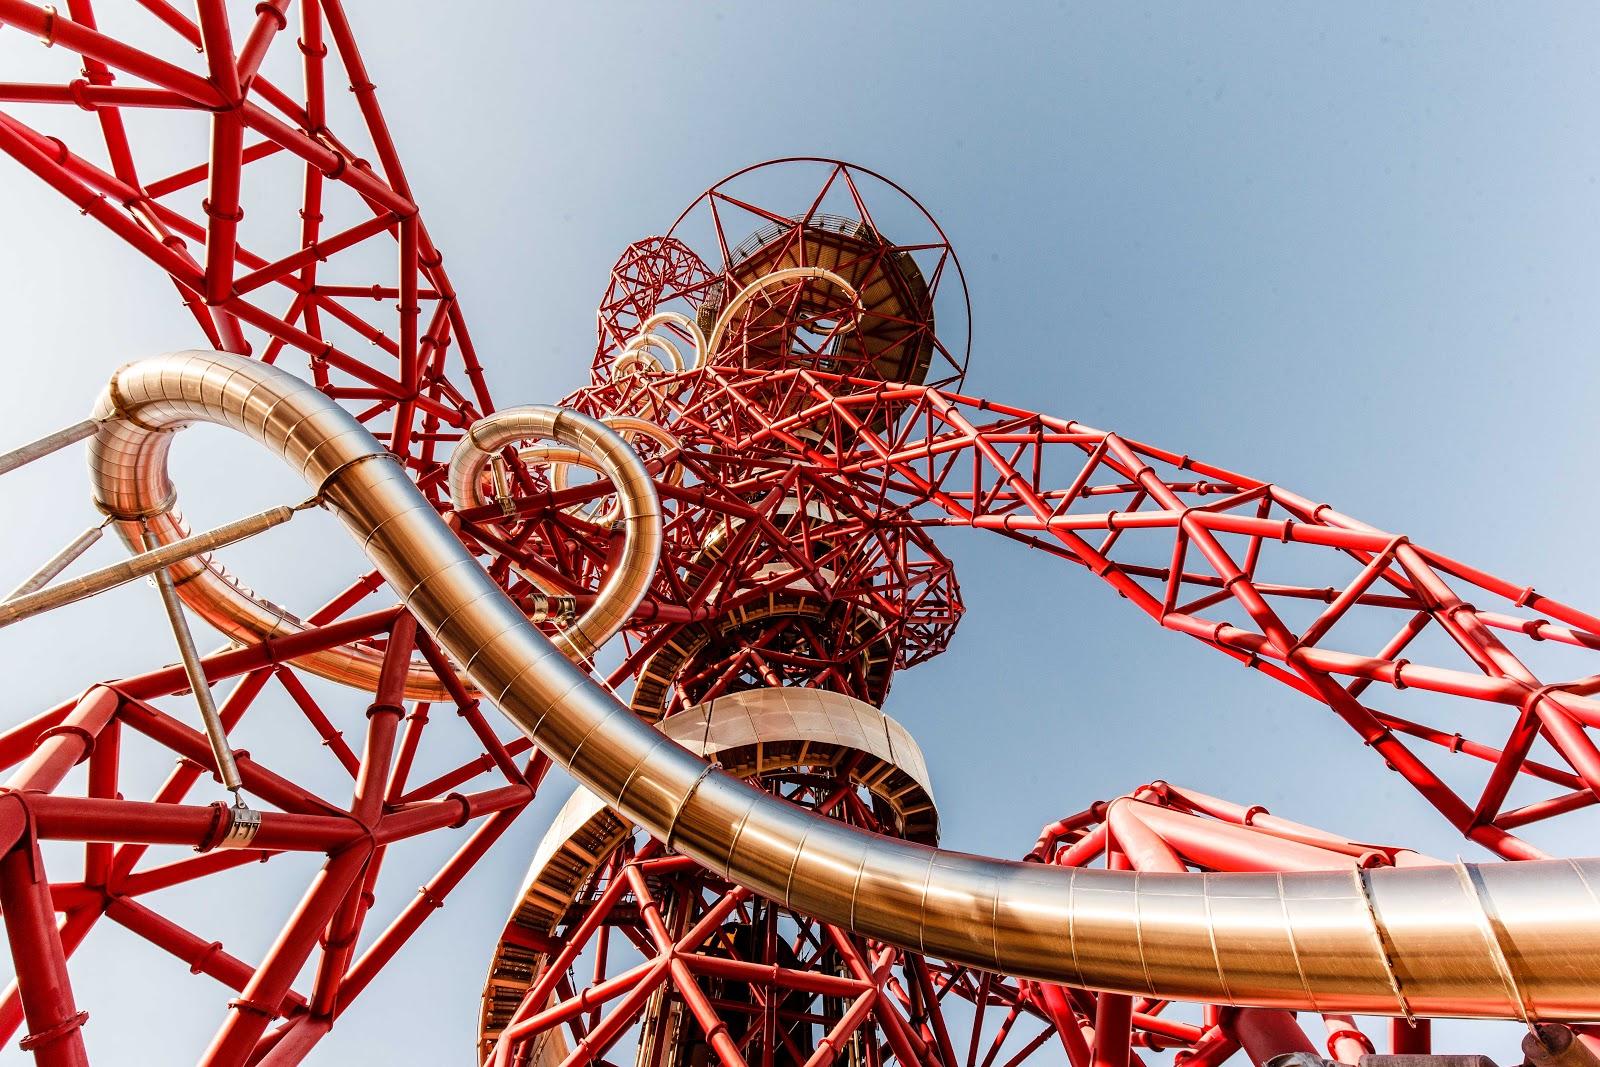 London - Verdens lengste sklie